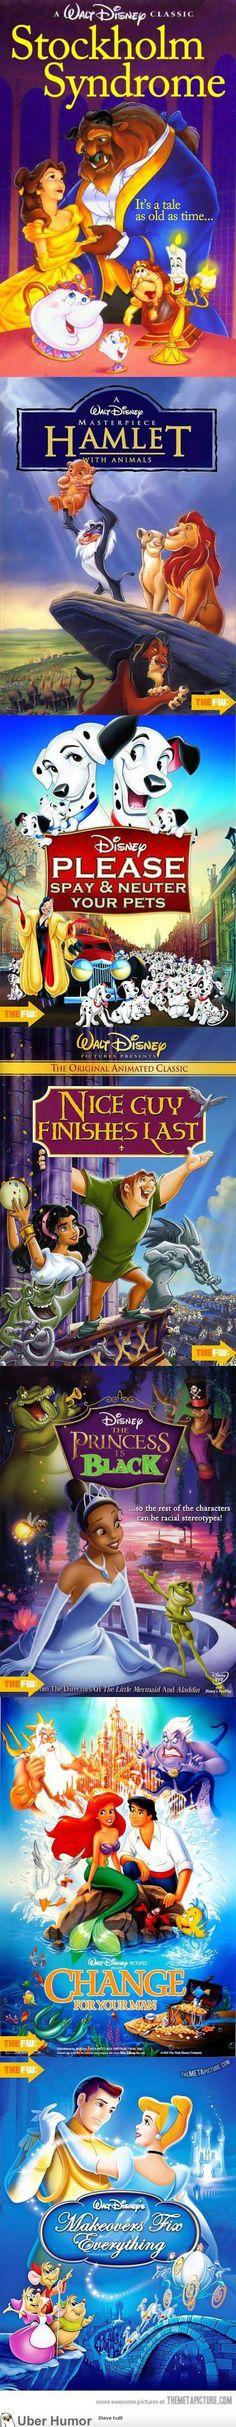 If Disney films had honest titles